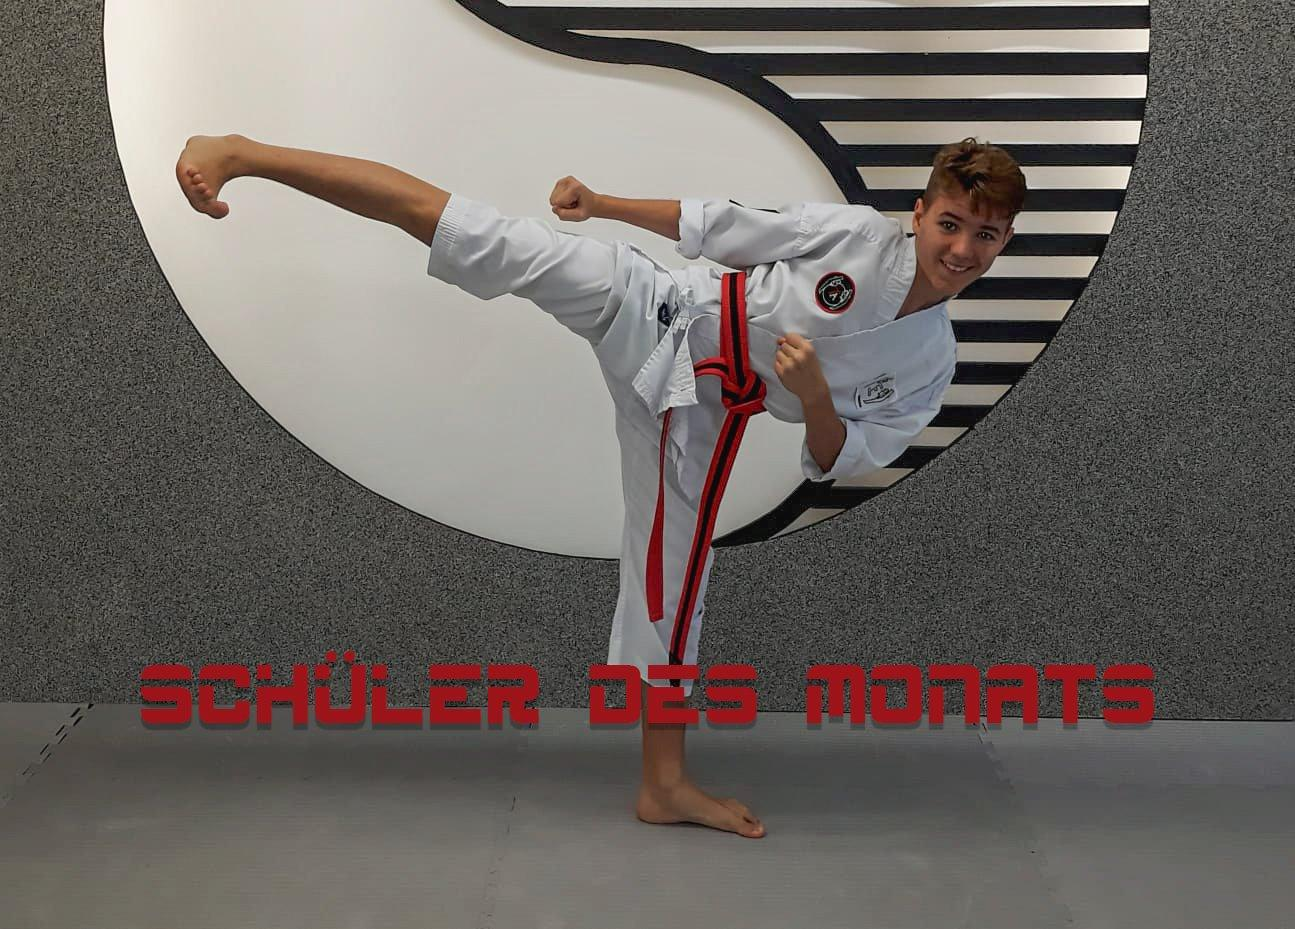 YOUNG-UNG Taekwondo Schüler des Monats